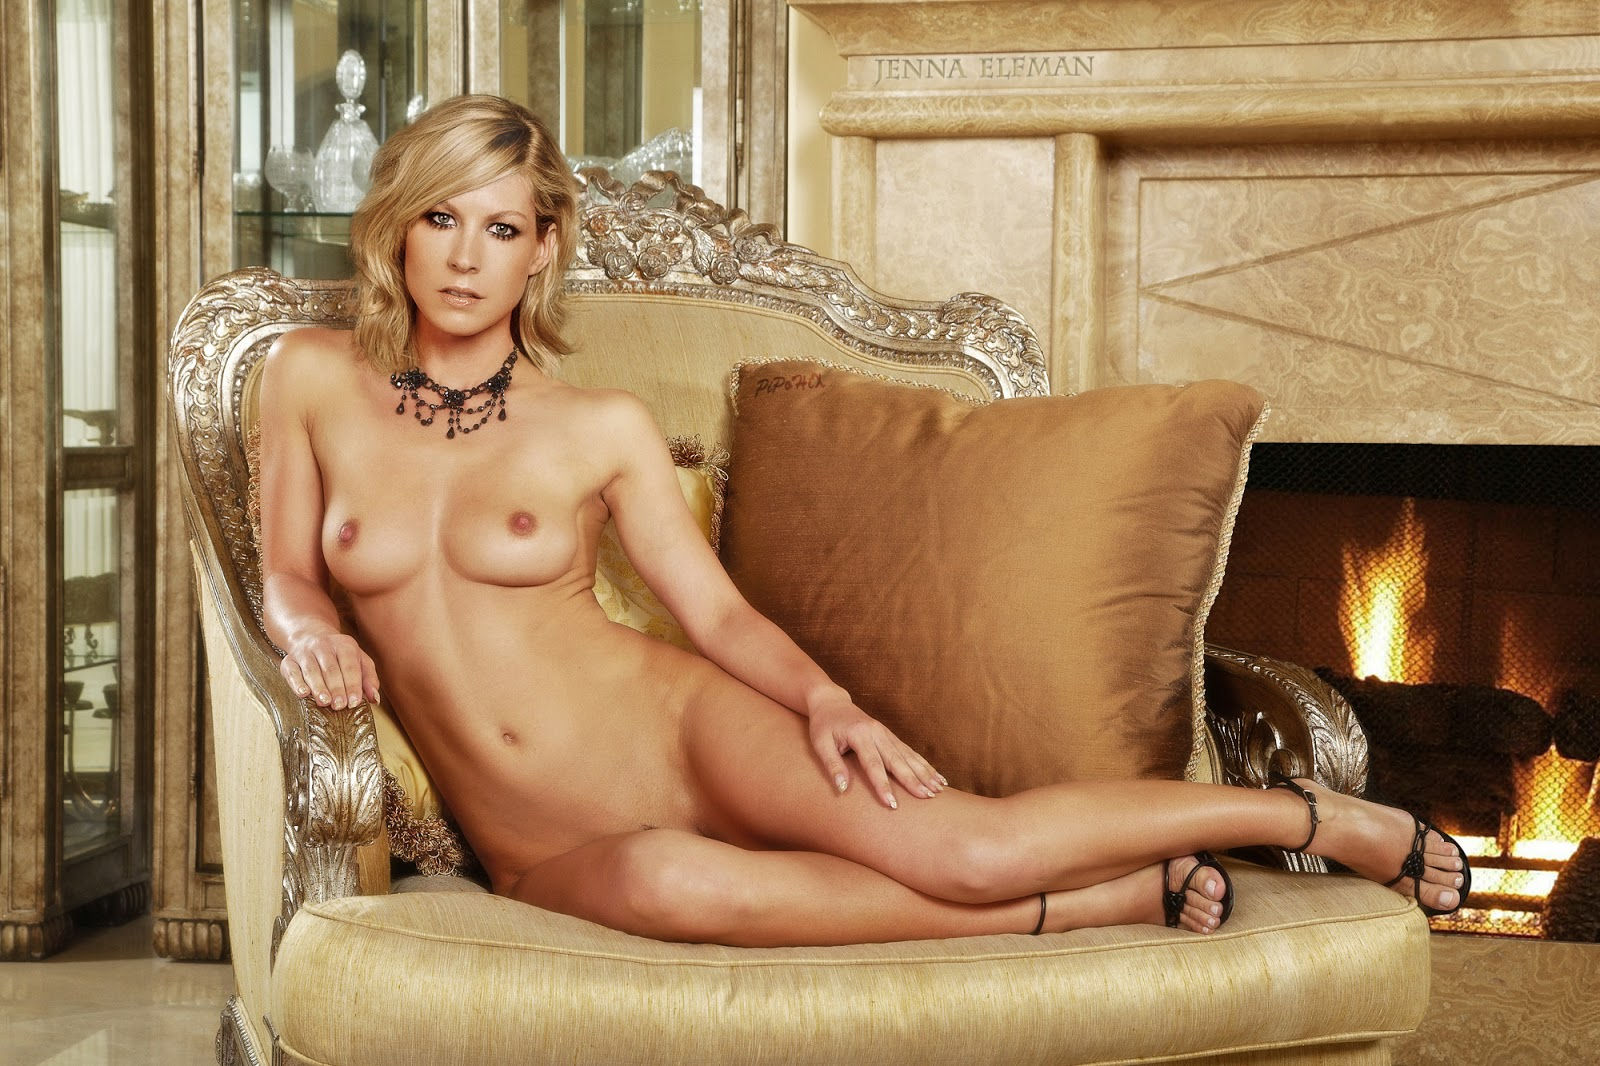 jenna elfman nude fakes download foto gambar wallpaper